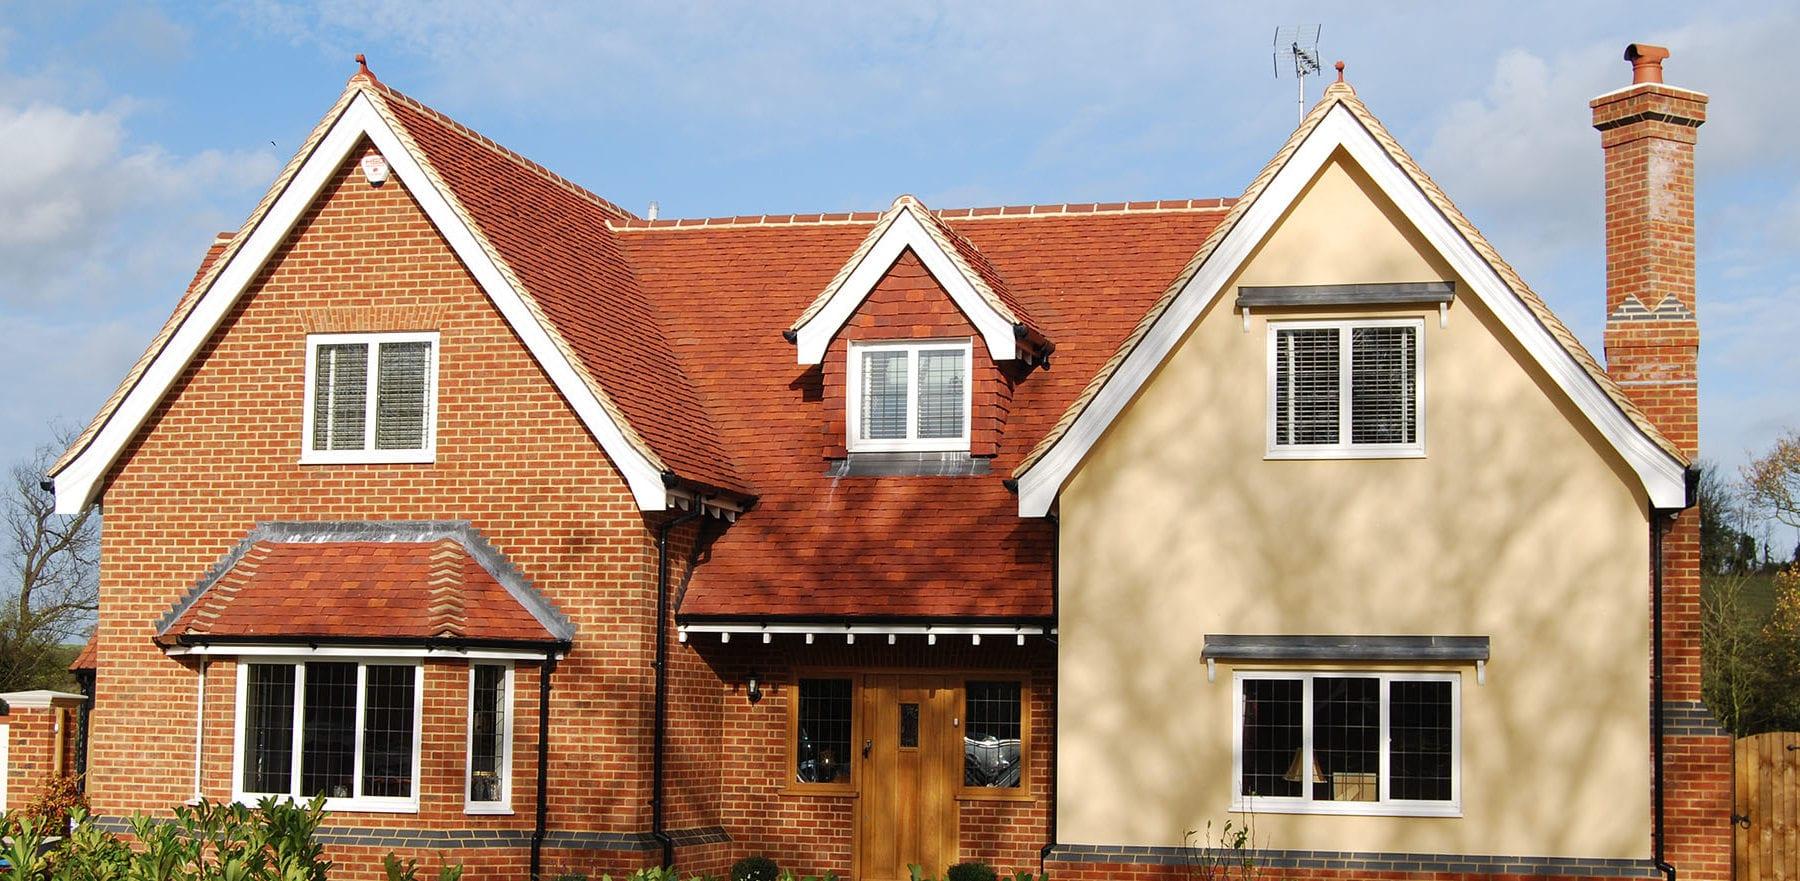 Lifestiles - Handmade Red Clay Roof Tiles - Rudley Oaks, England 2